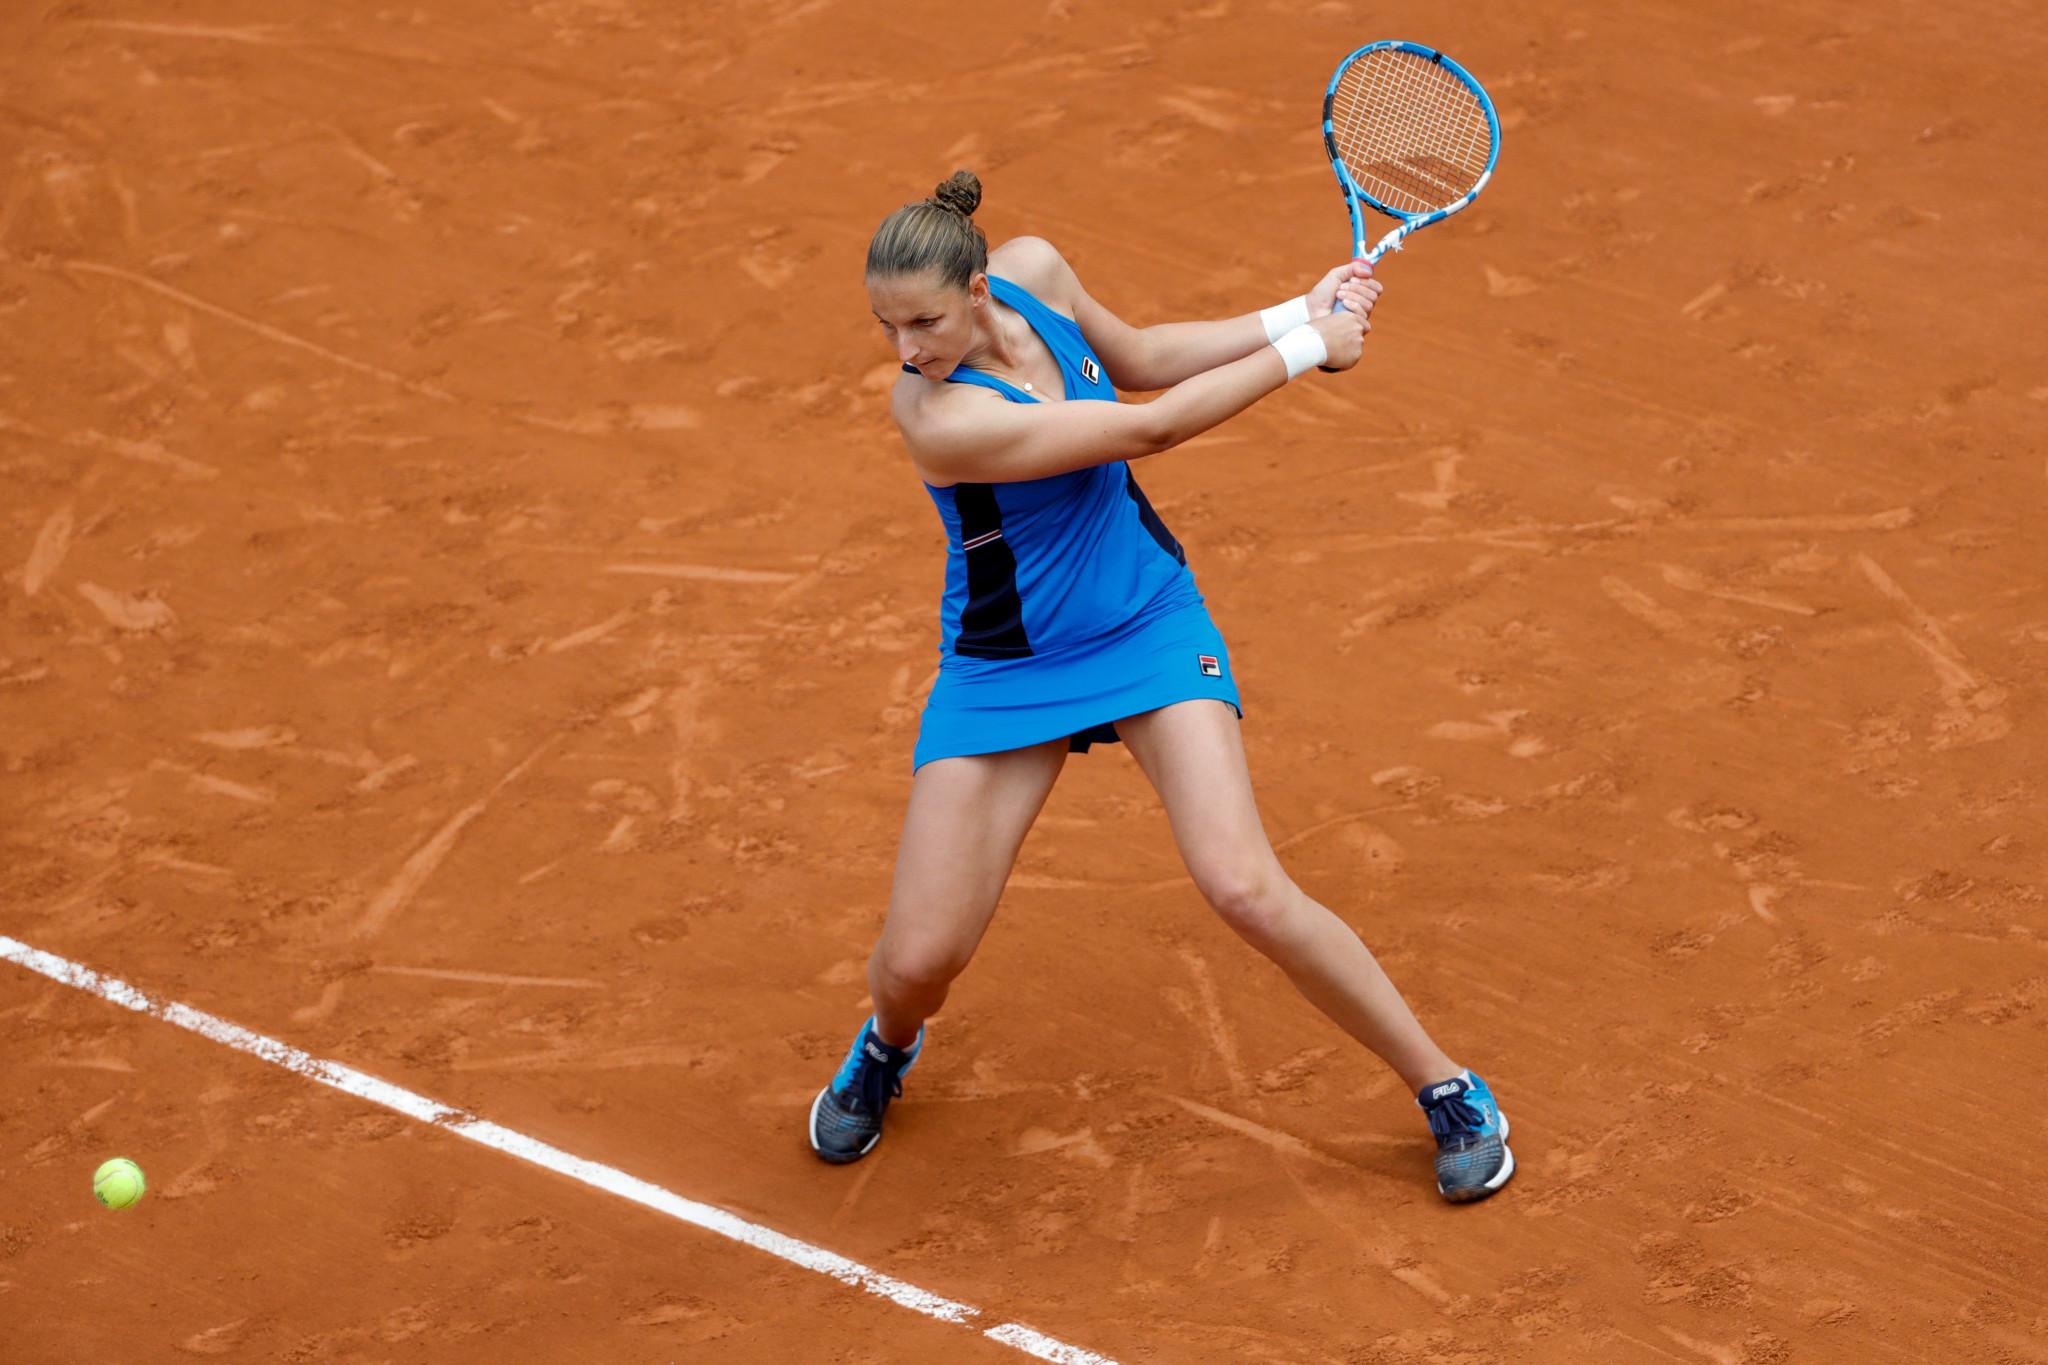 Karolína Plíšková continues hunt for maiden Grand Slam as reaches French Open round three